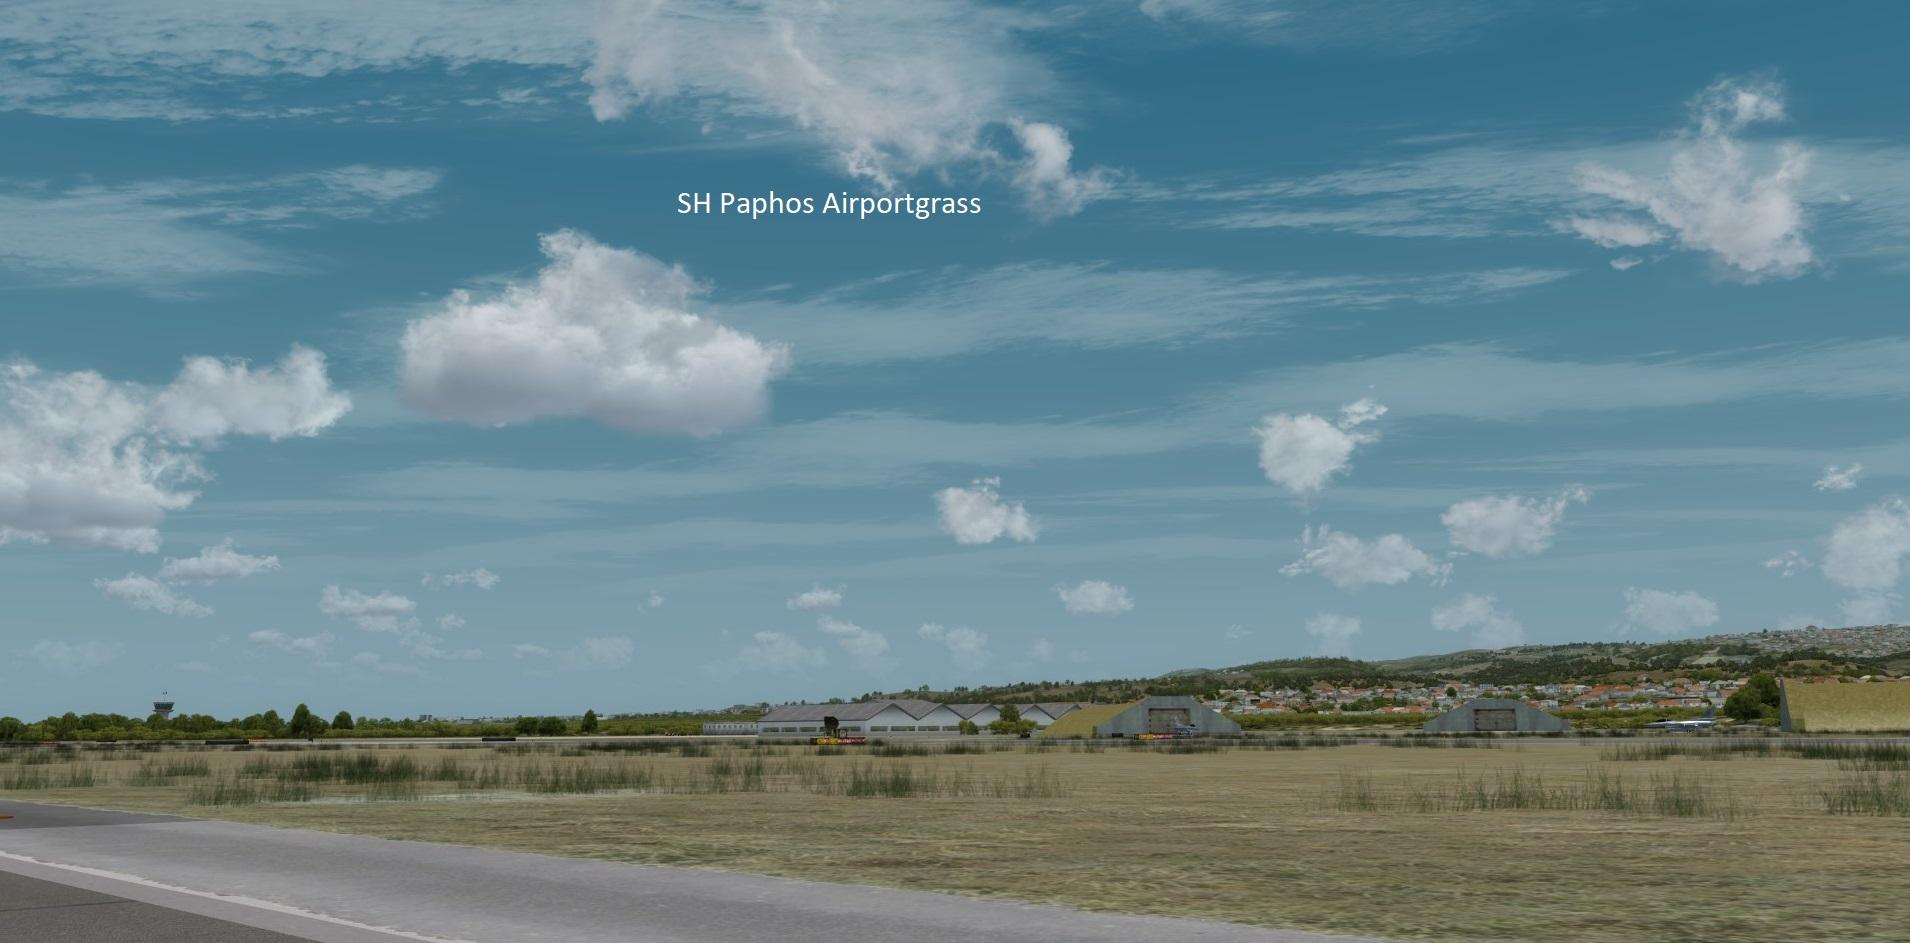 airportgrass5ps9f.jpg